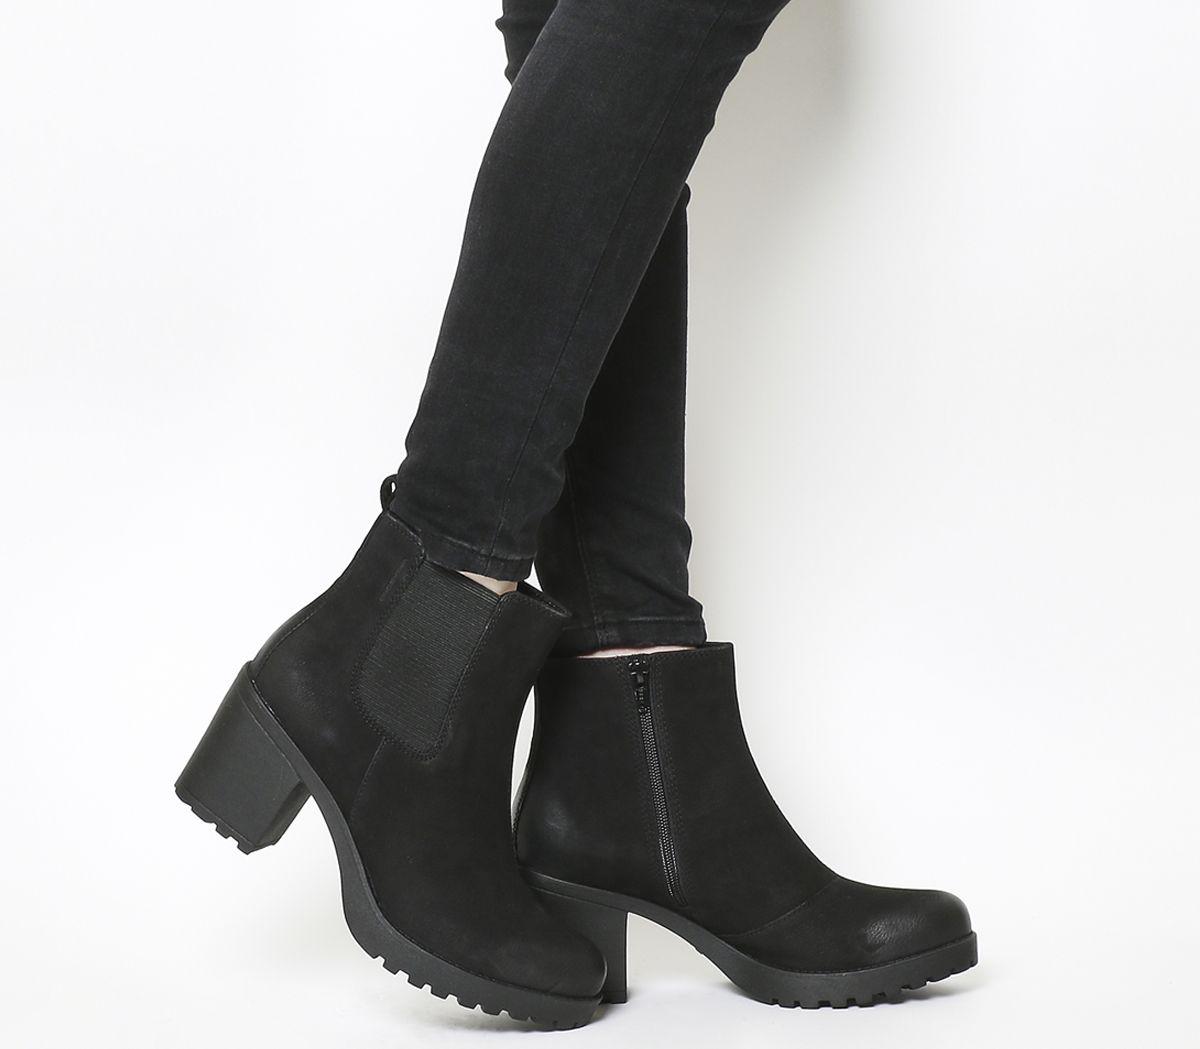 4ce355f32288 Vagabond Grace Heeled Chelsea Boots Black Nubuck - Ankle Boots